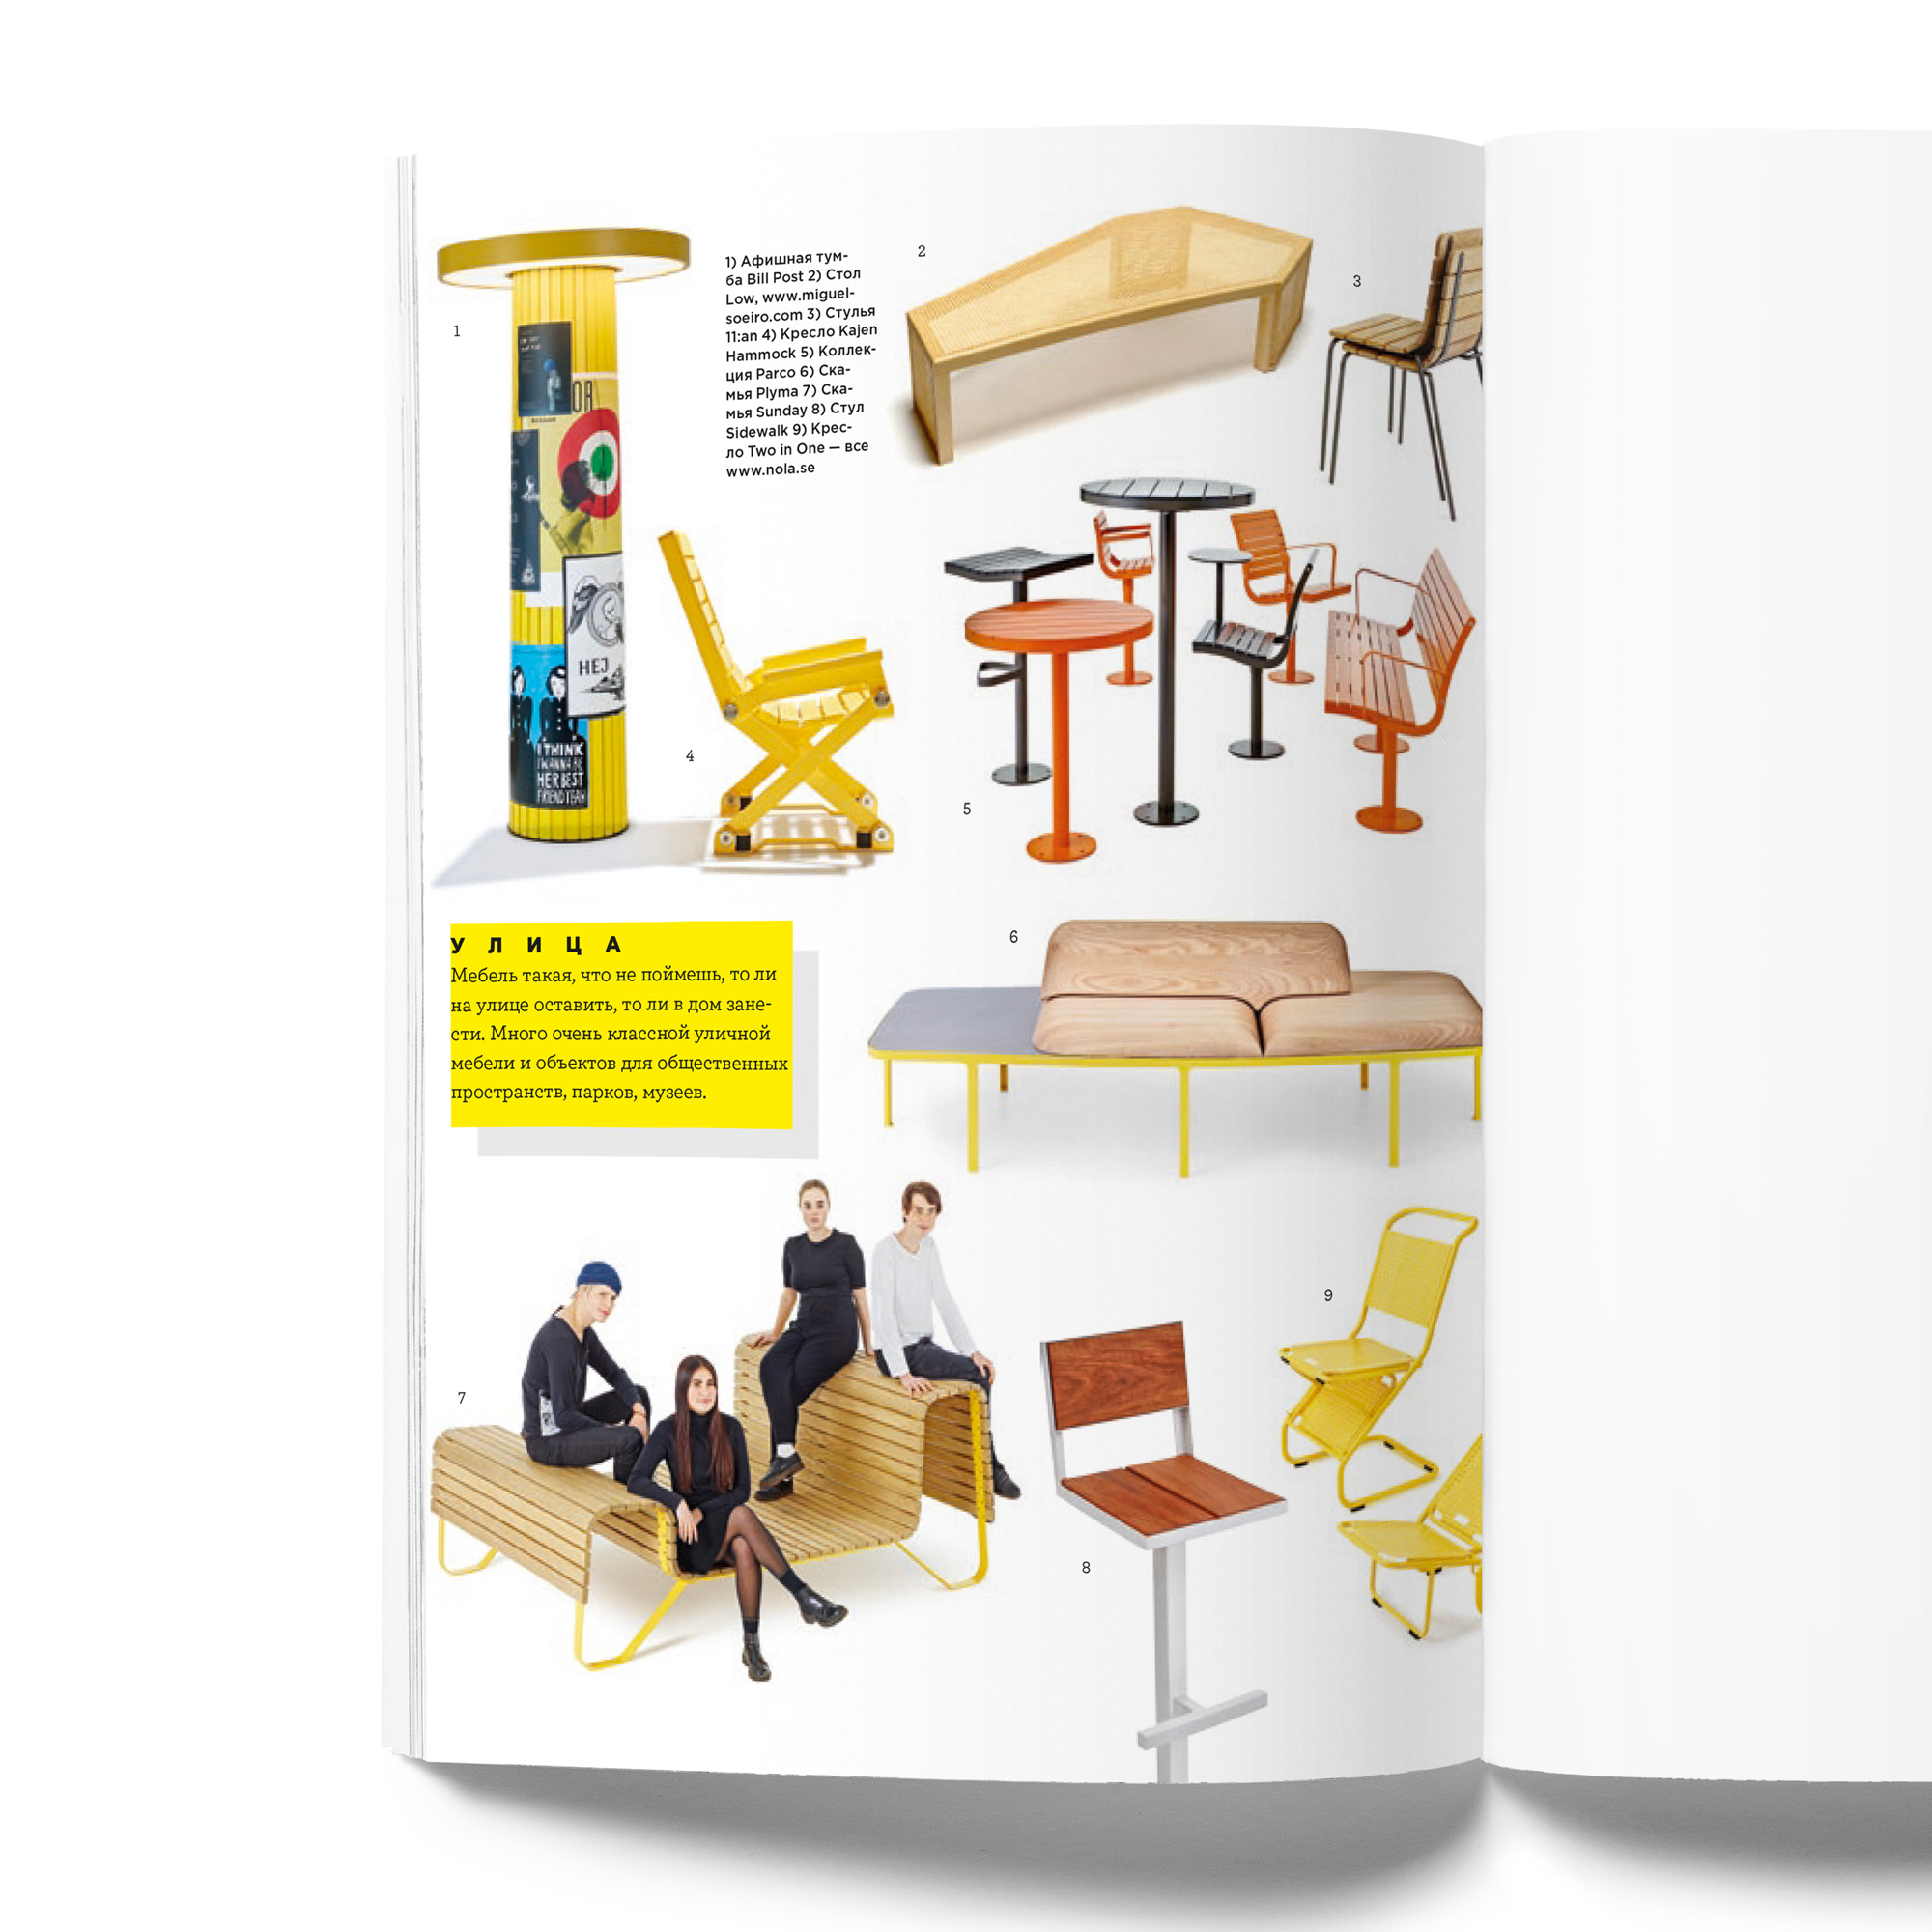 Seasons Inner Page - DESIGN BY MIGUEL SOEIRO